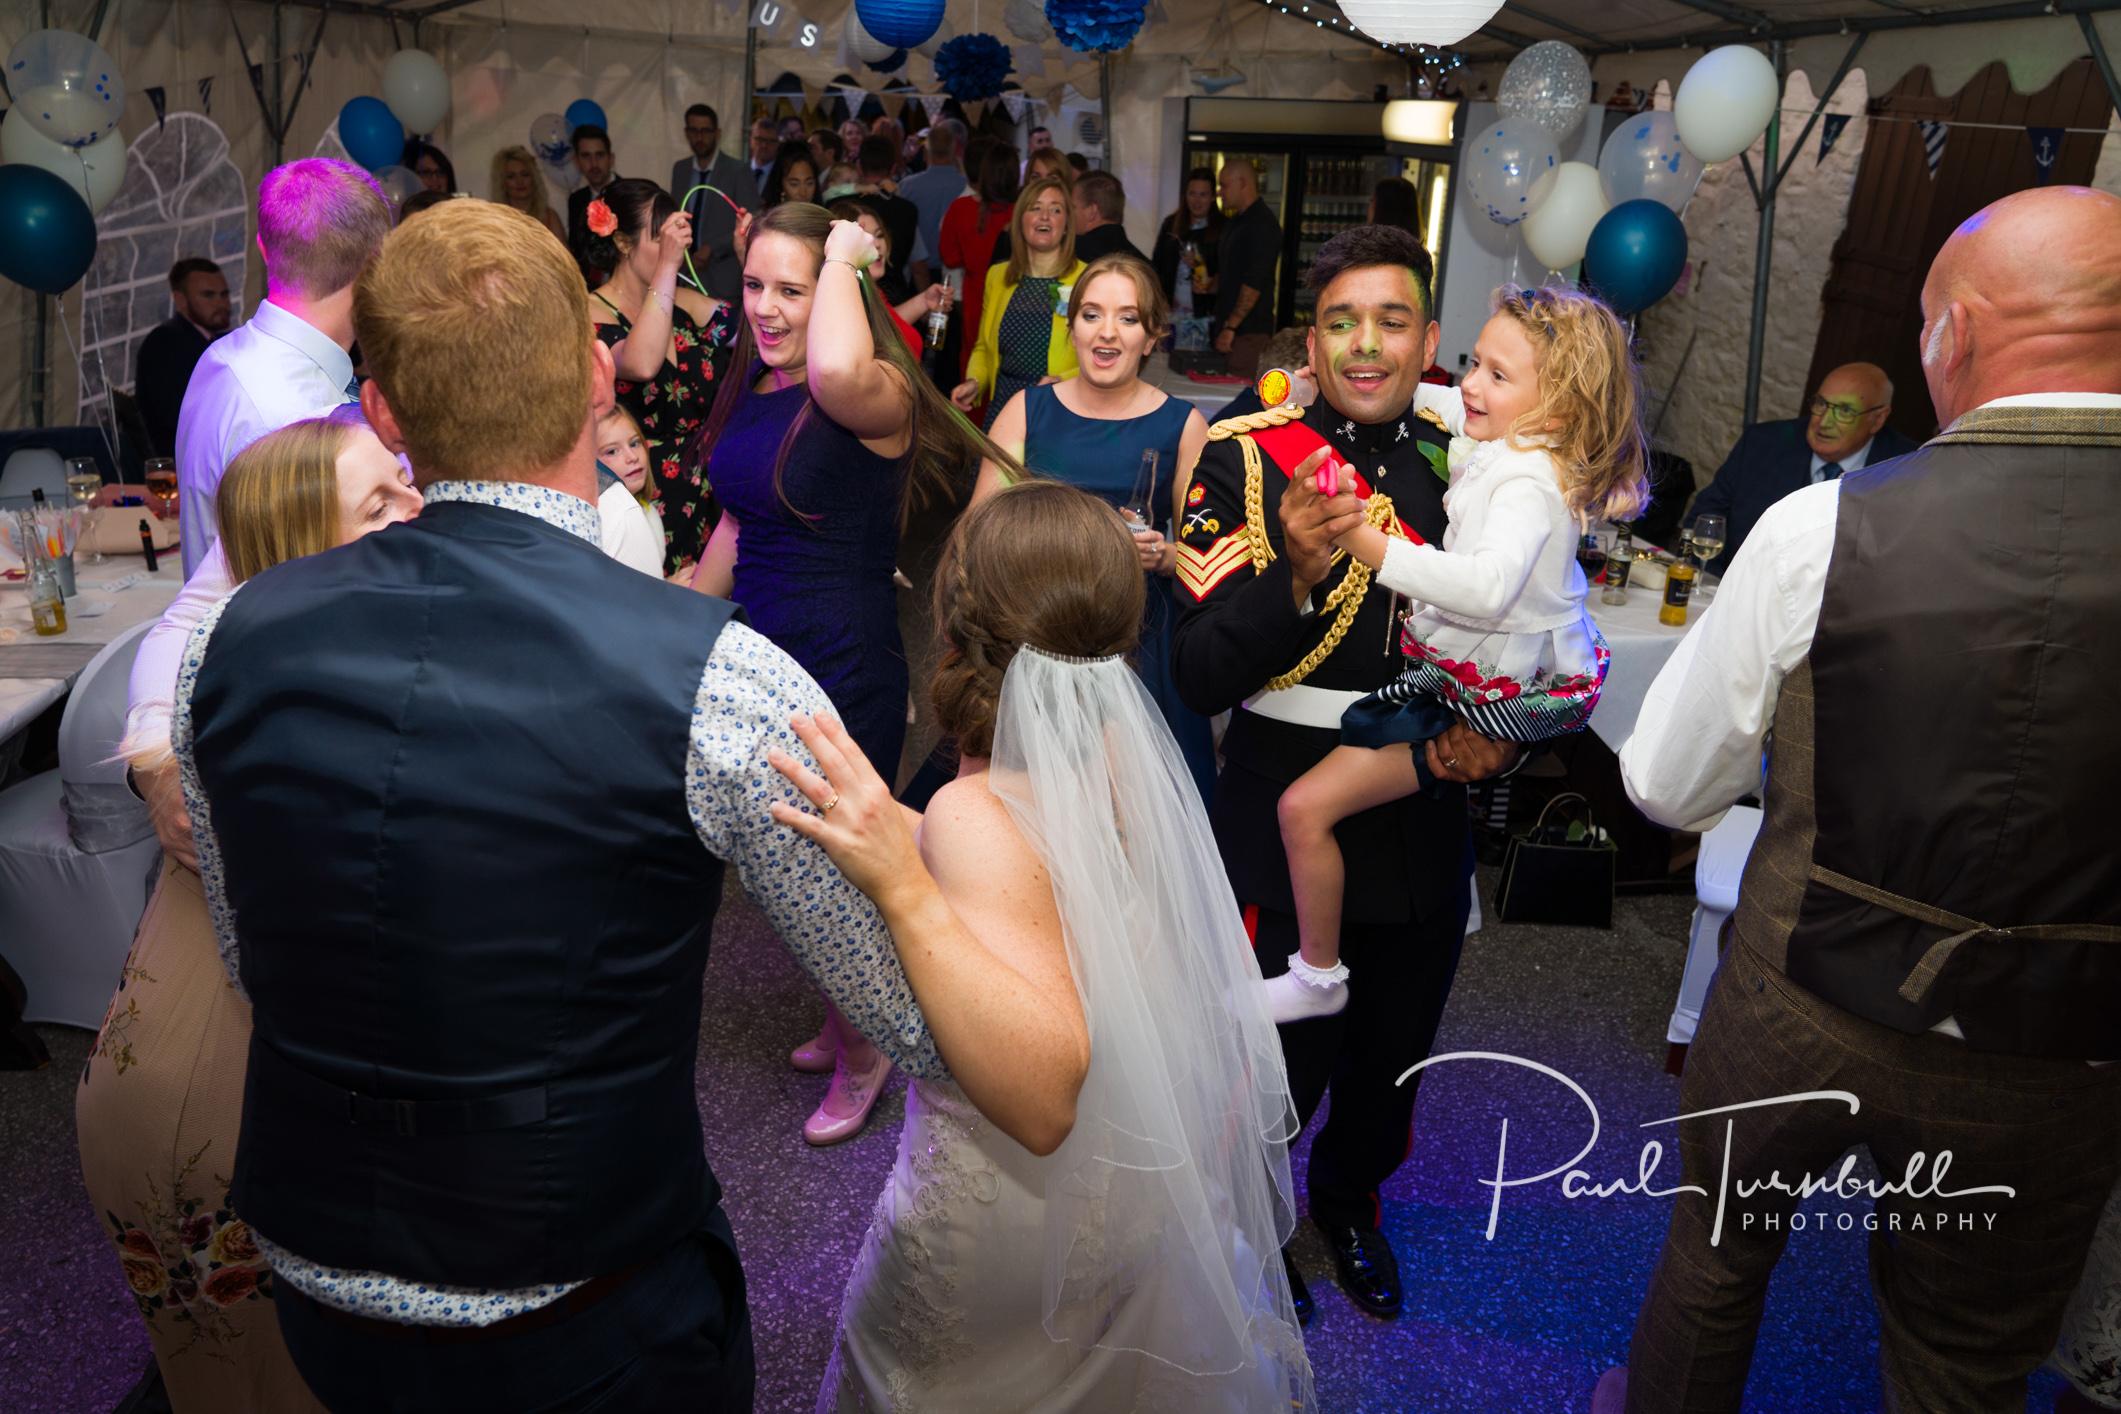 wedding-photographer-south-dalton-walkington-yorkshire-emma-james-083.jpg